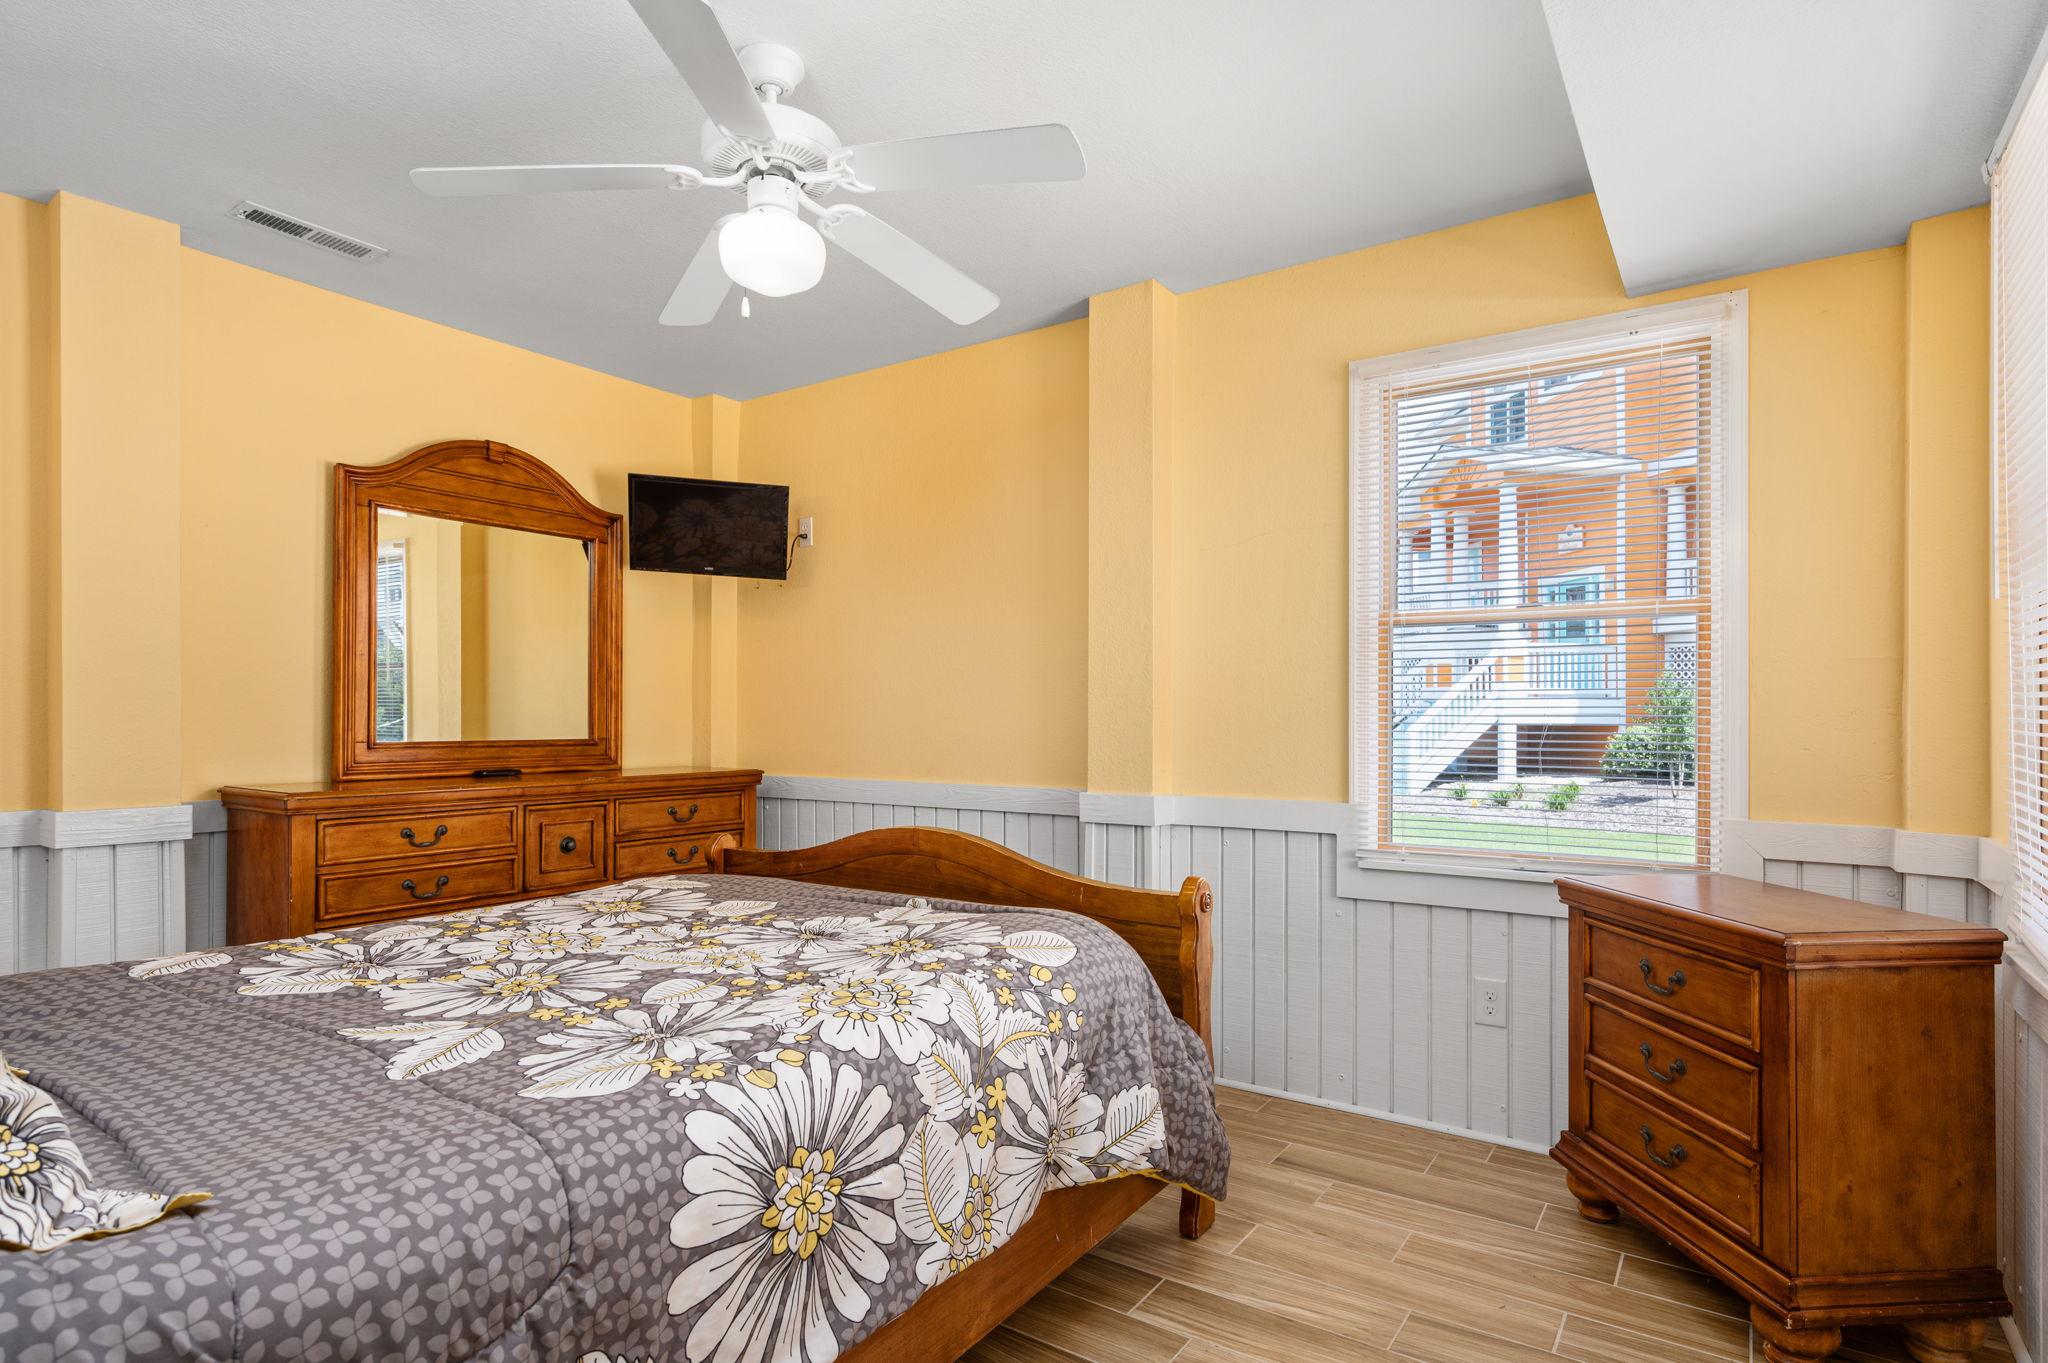 795 Mercury Road   Bottom Level Bedroom 2